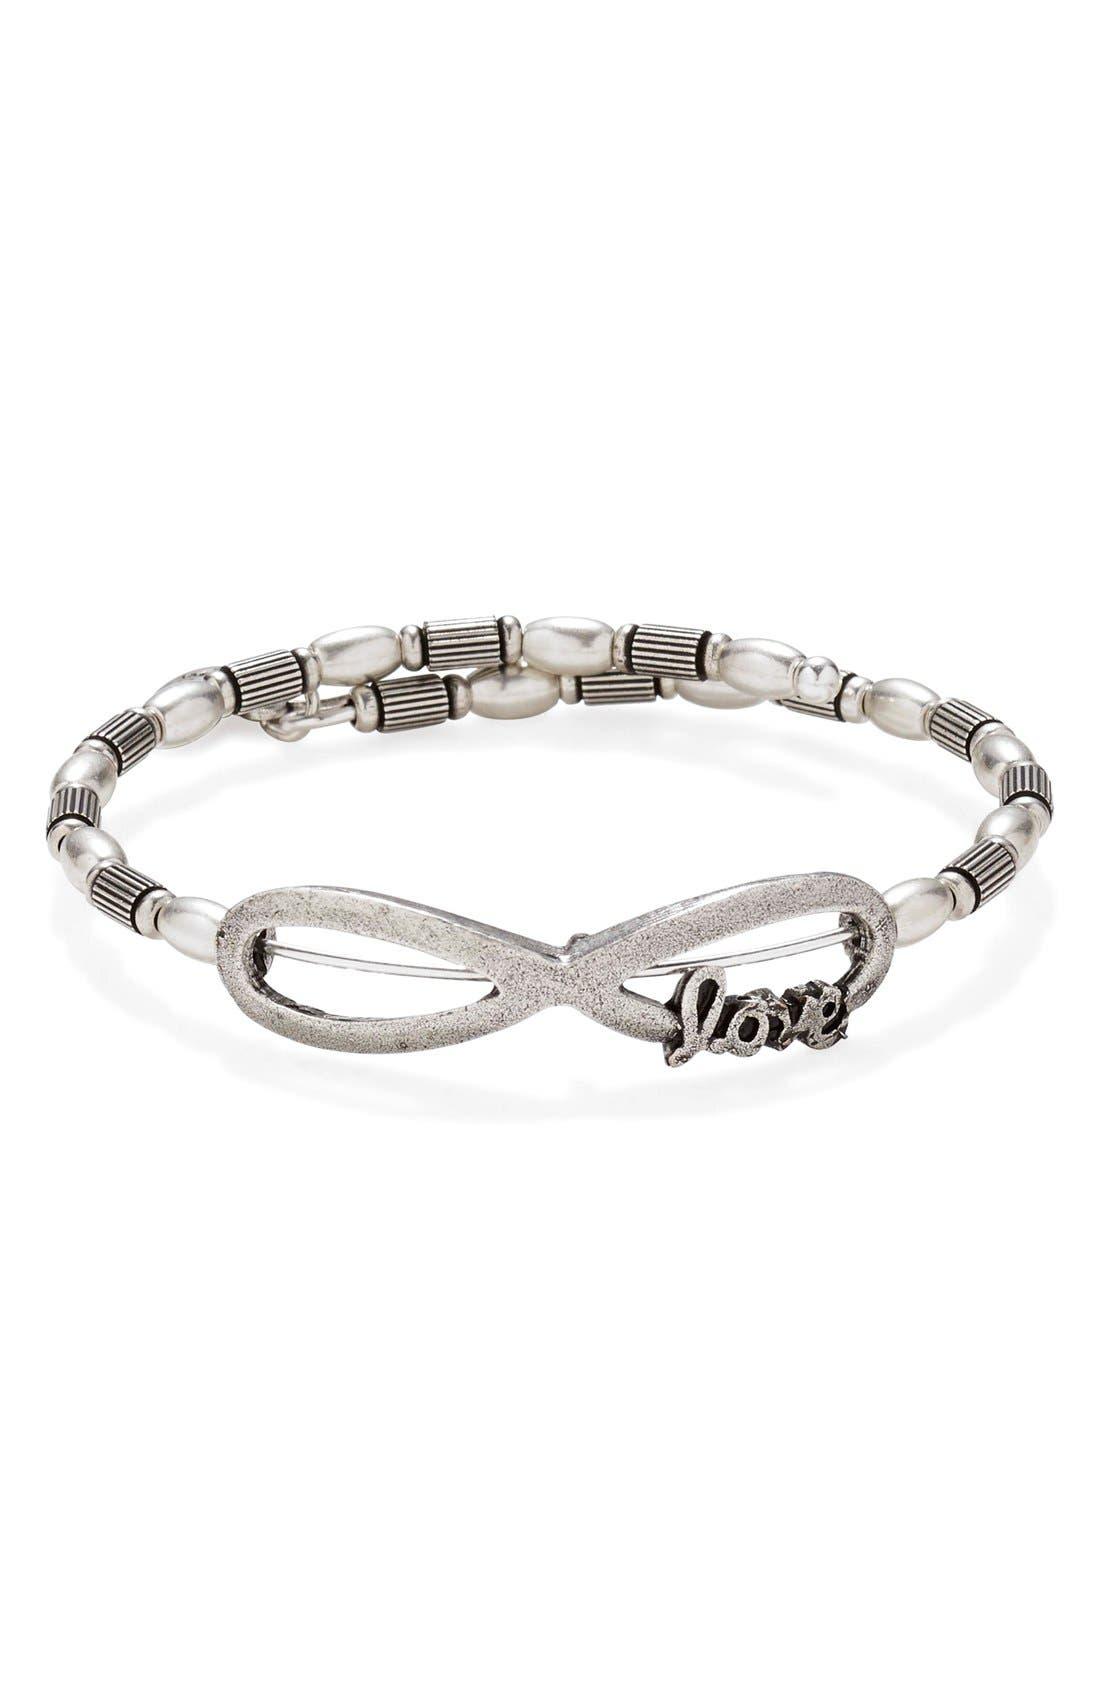 Main Image - Alex and Ani 'Infinite Love' Wrap Bracelet